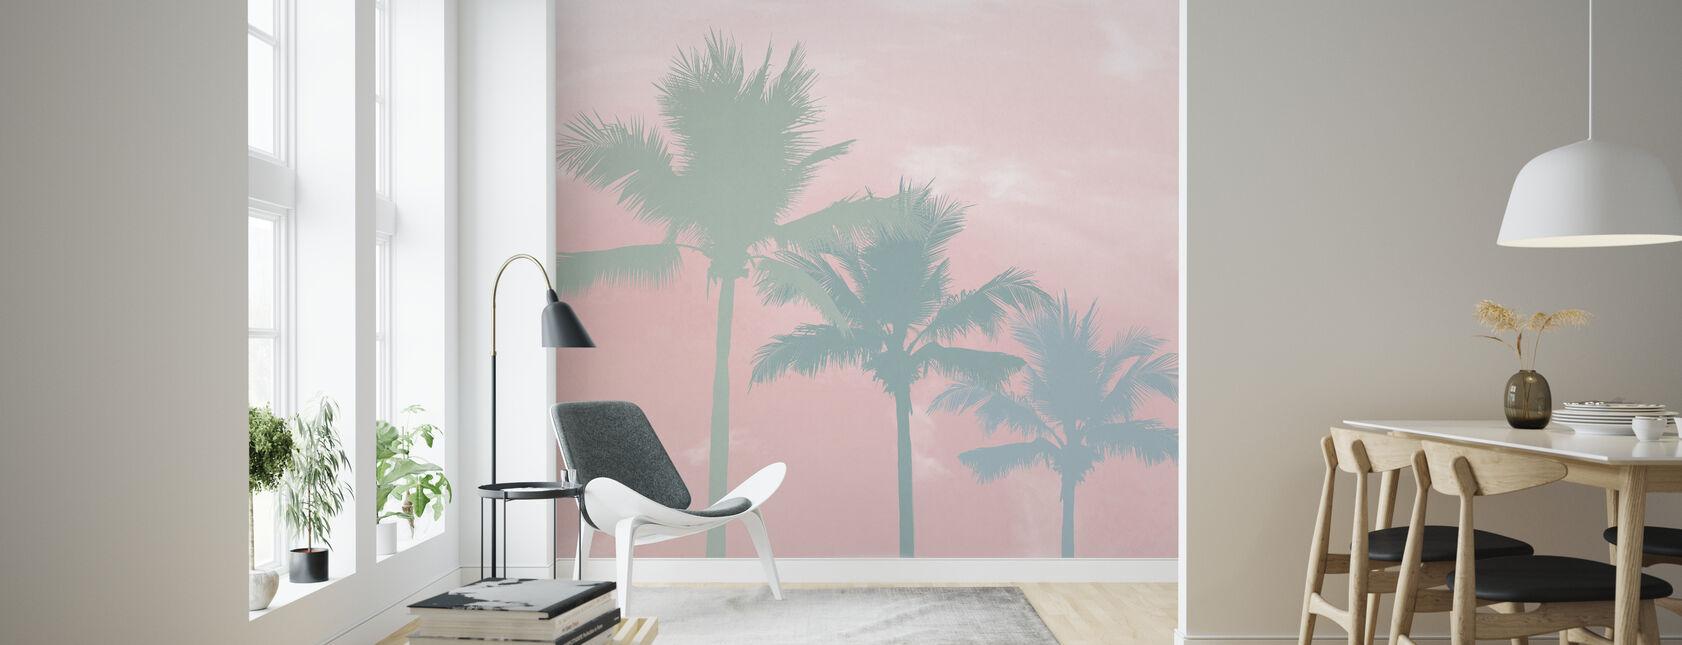 Sunset Palm Trees - Wallpaper - Living Room